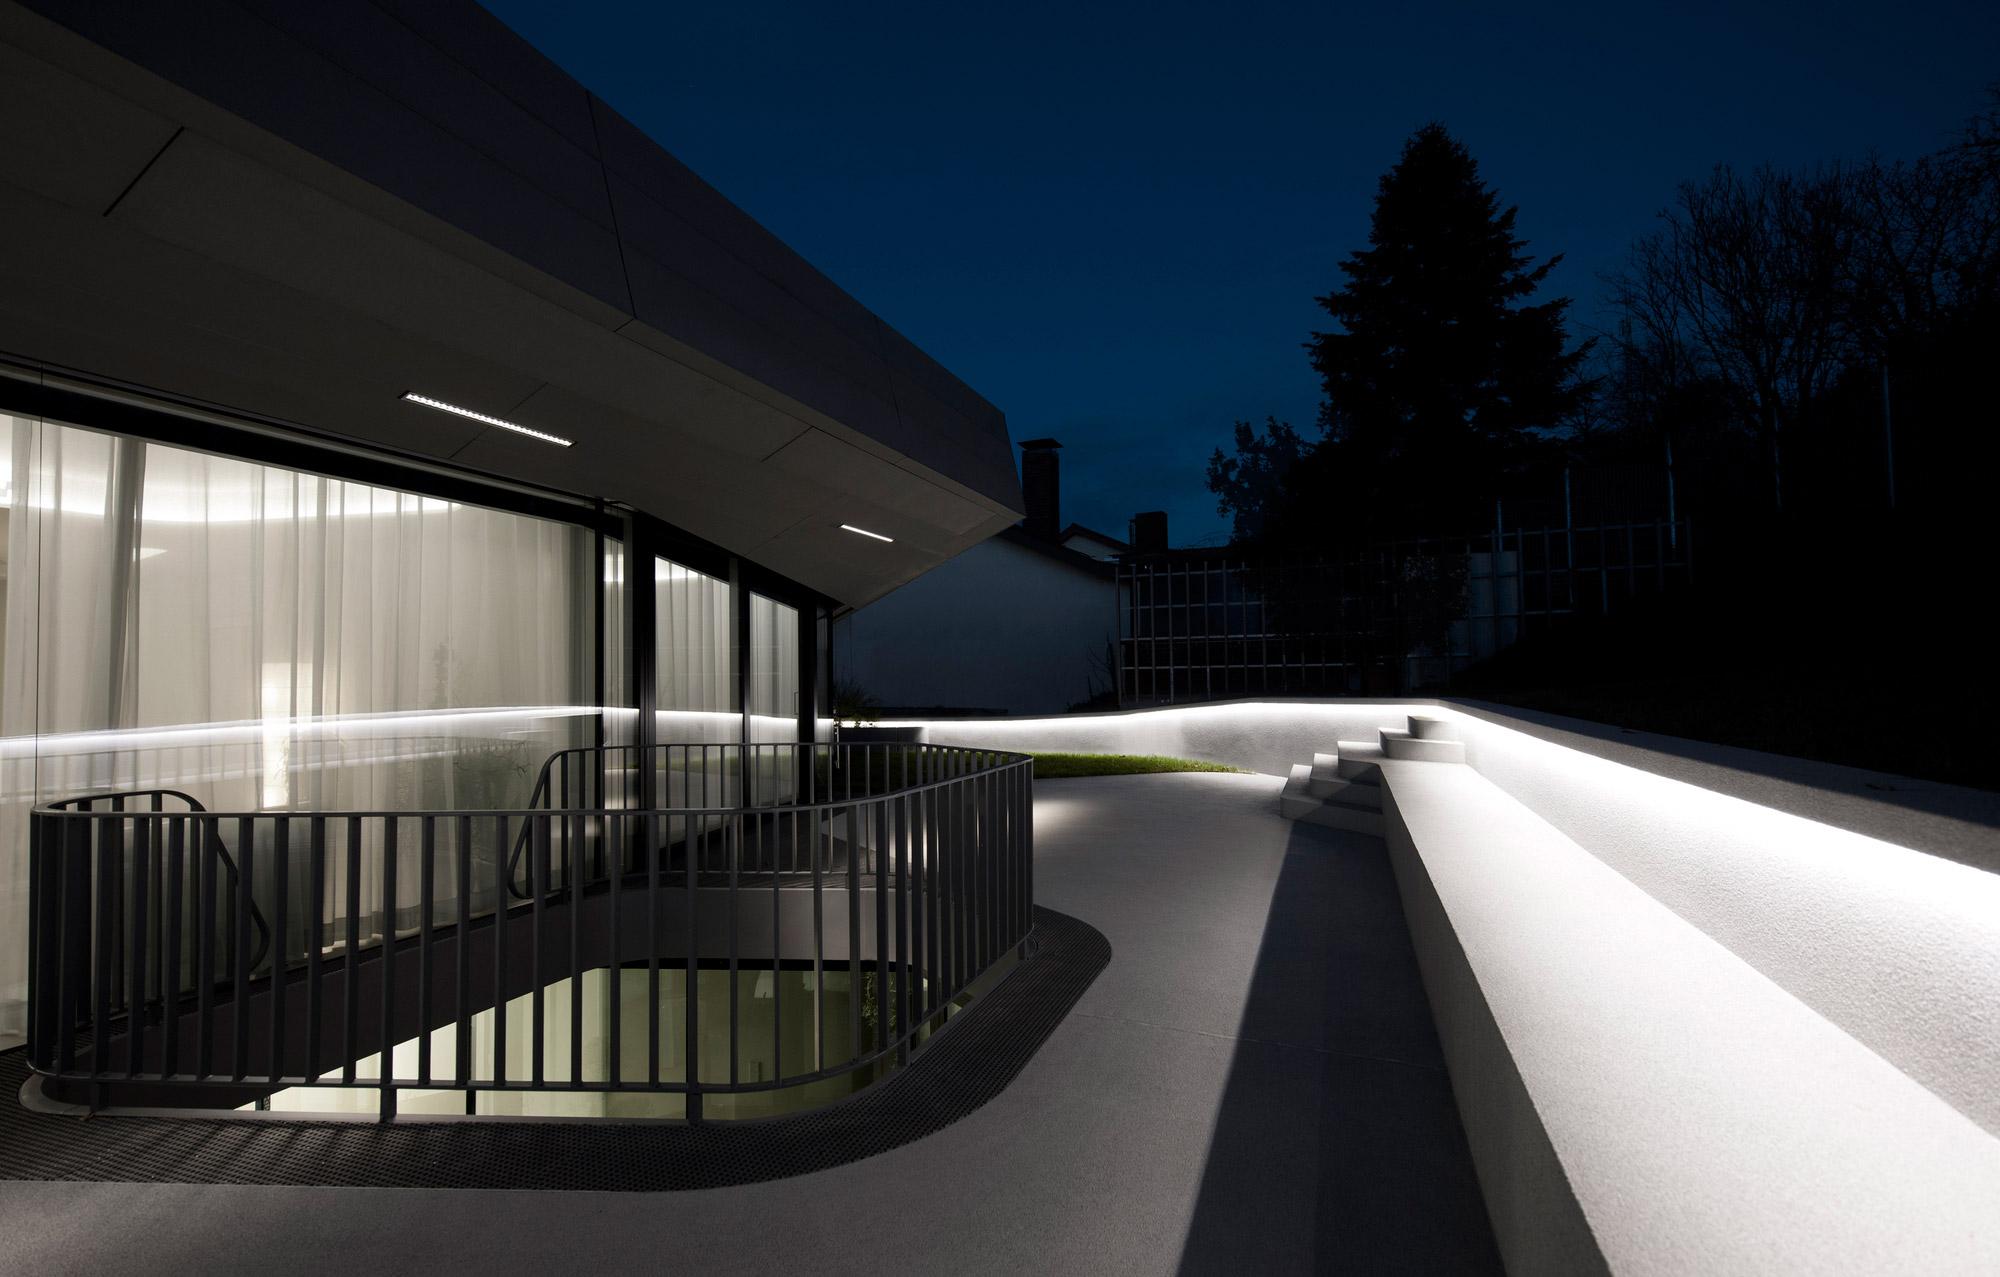 OLS_House-Jurgen_Mayer_h_architects-17.jpg